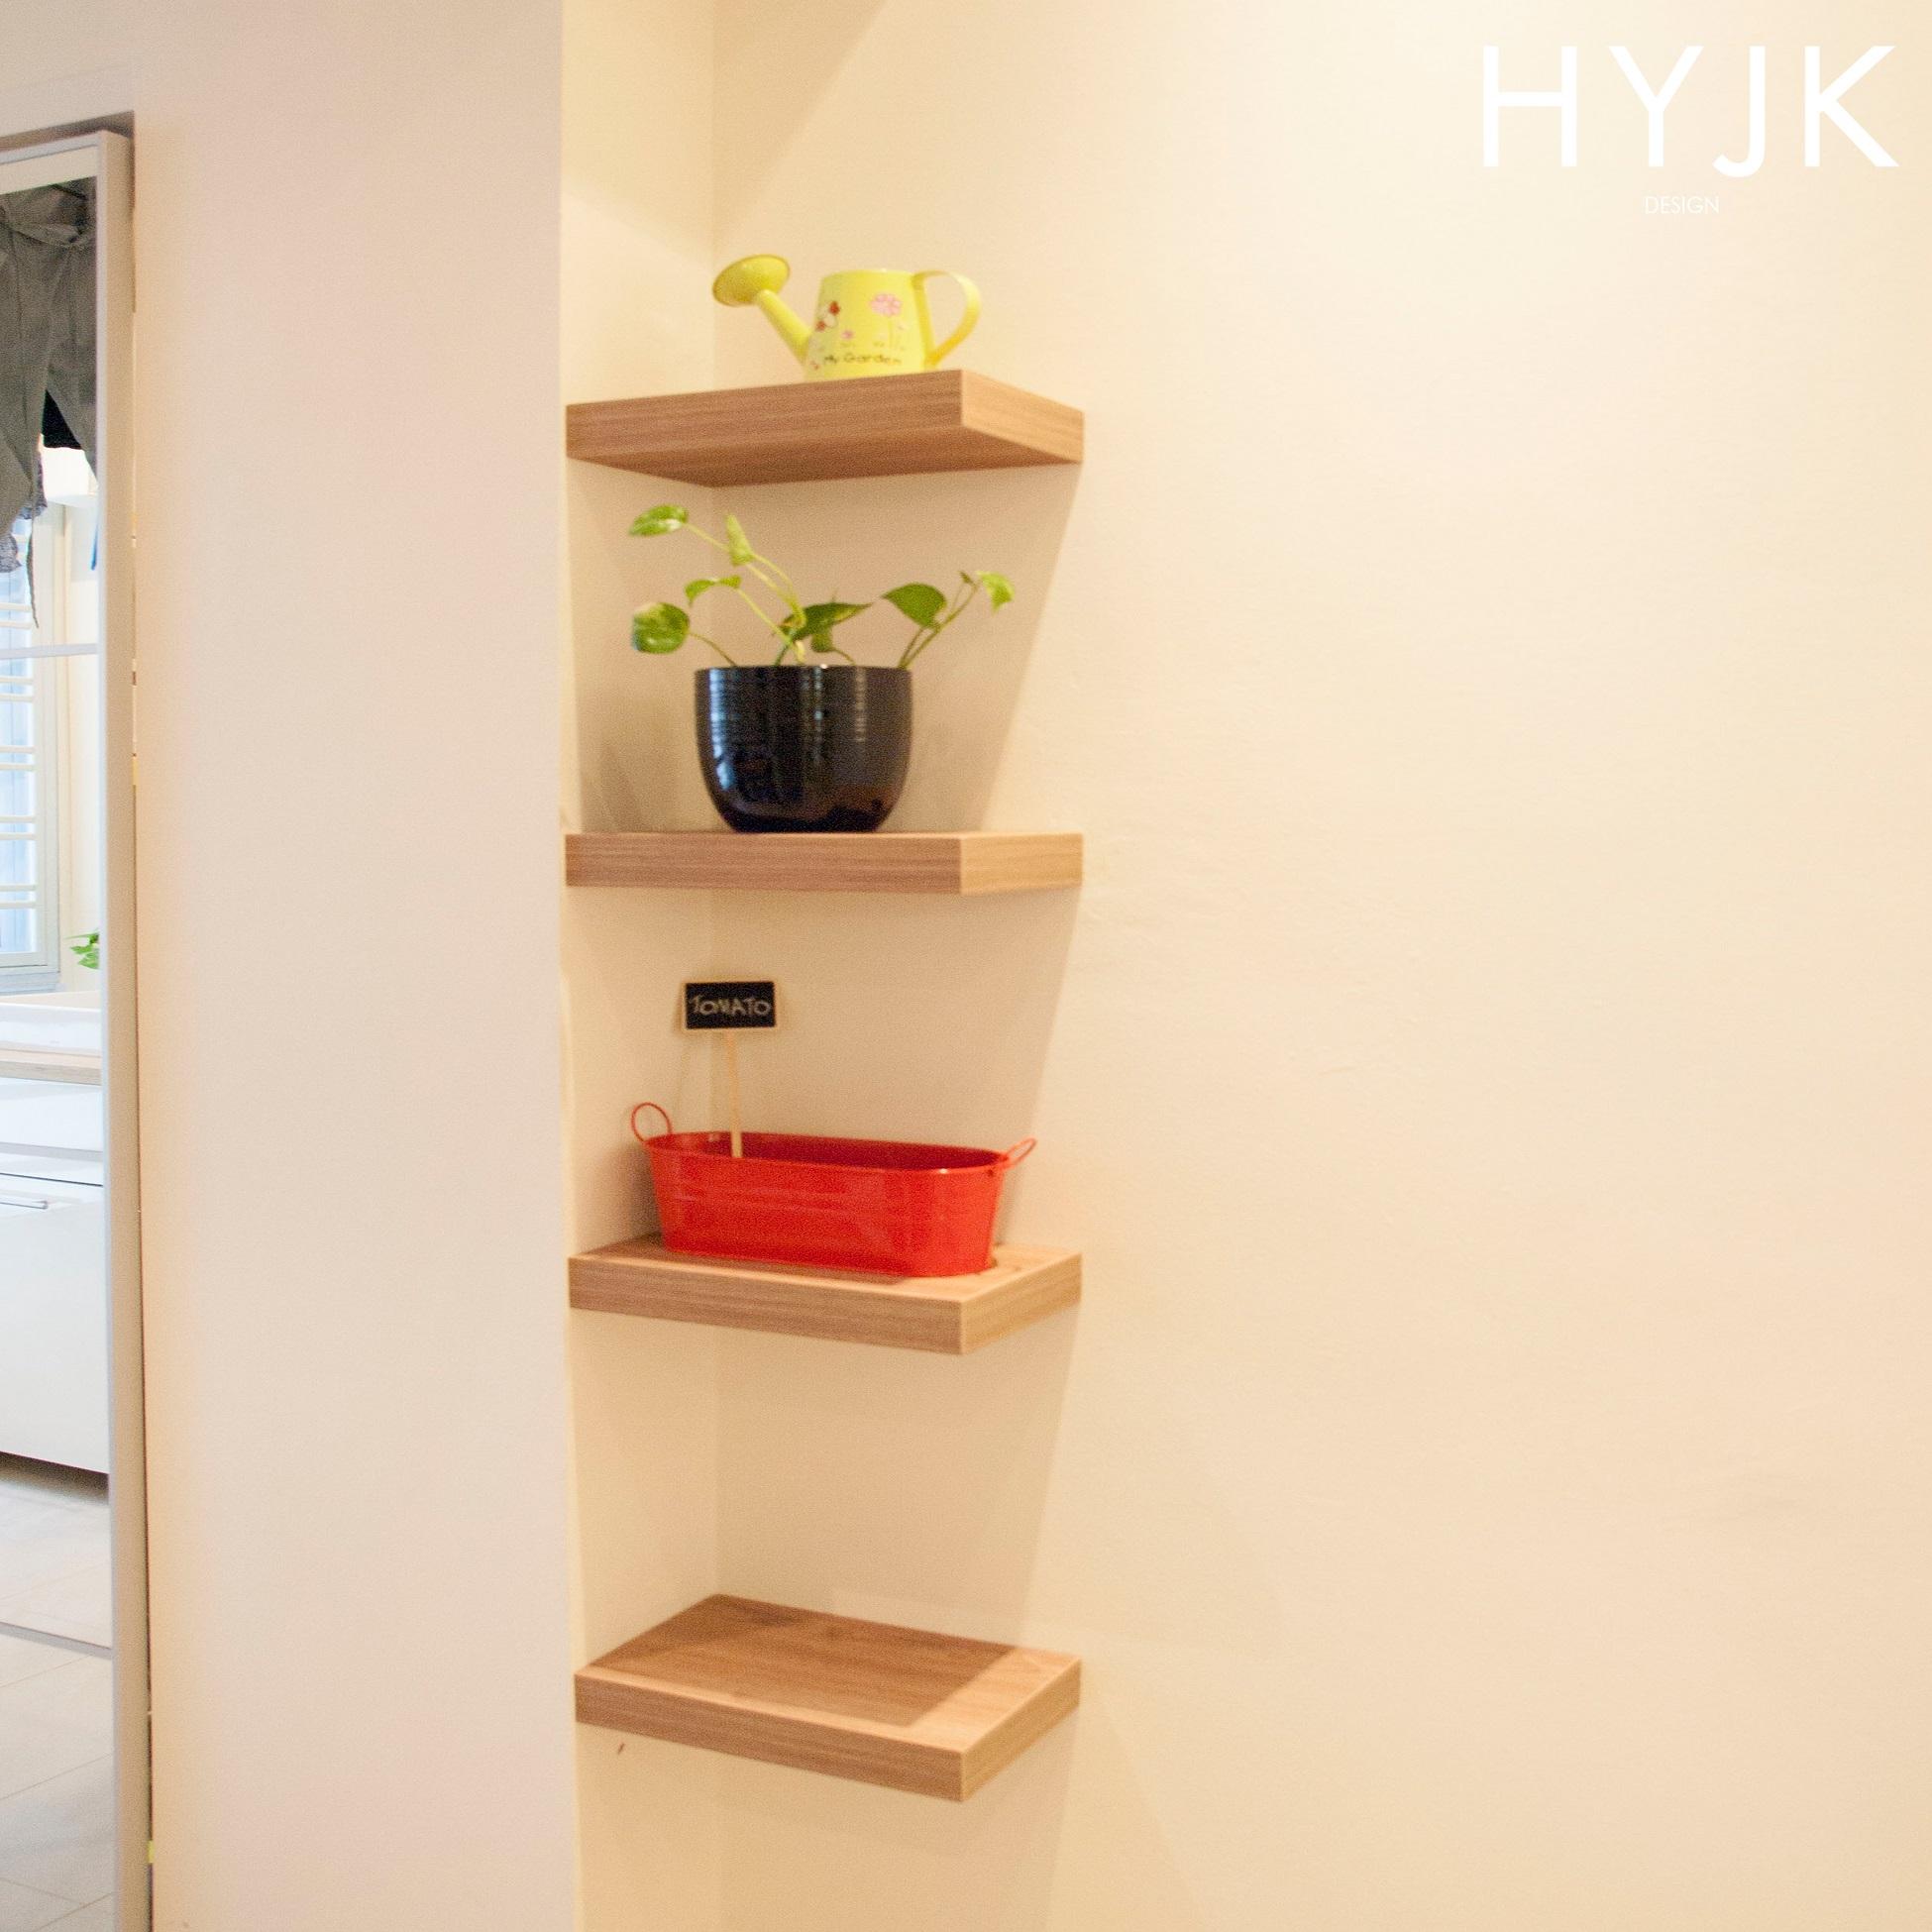 Adorable little shelves